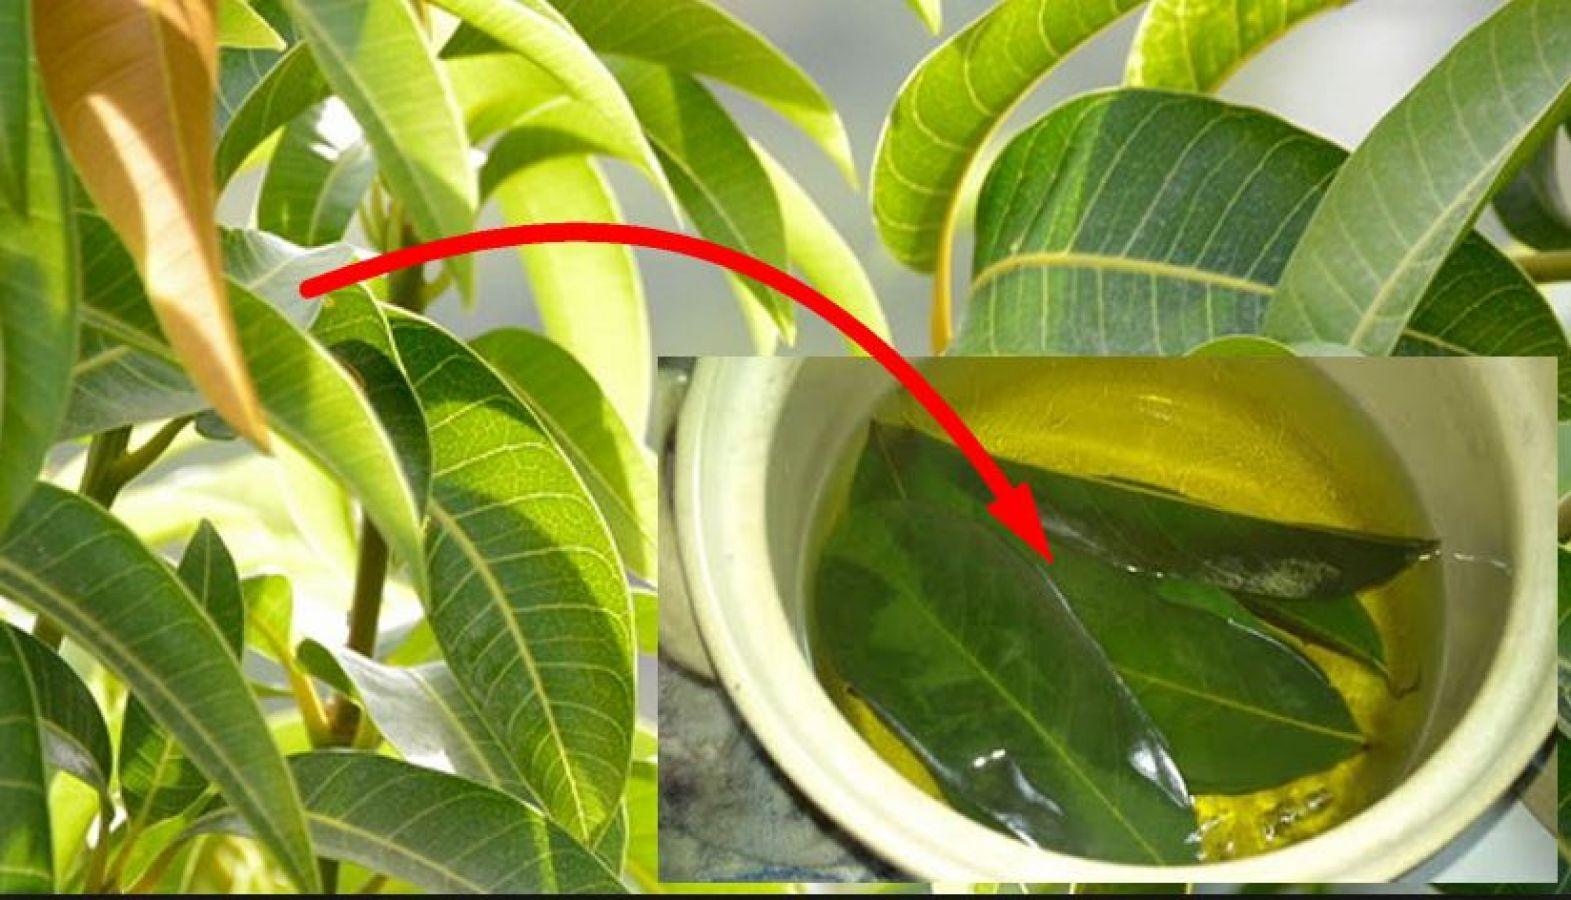 Drink mango leaves tea, health benefits | News Track Live ...